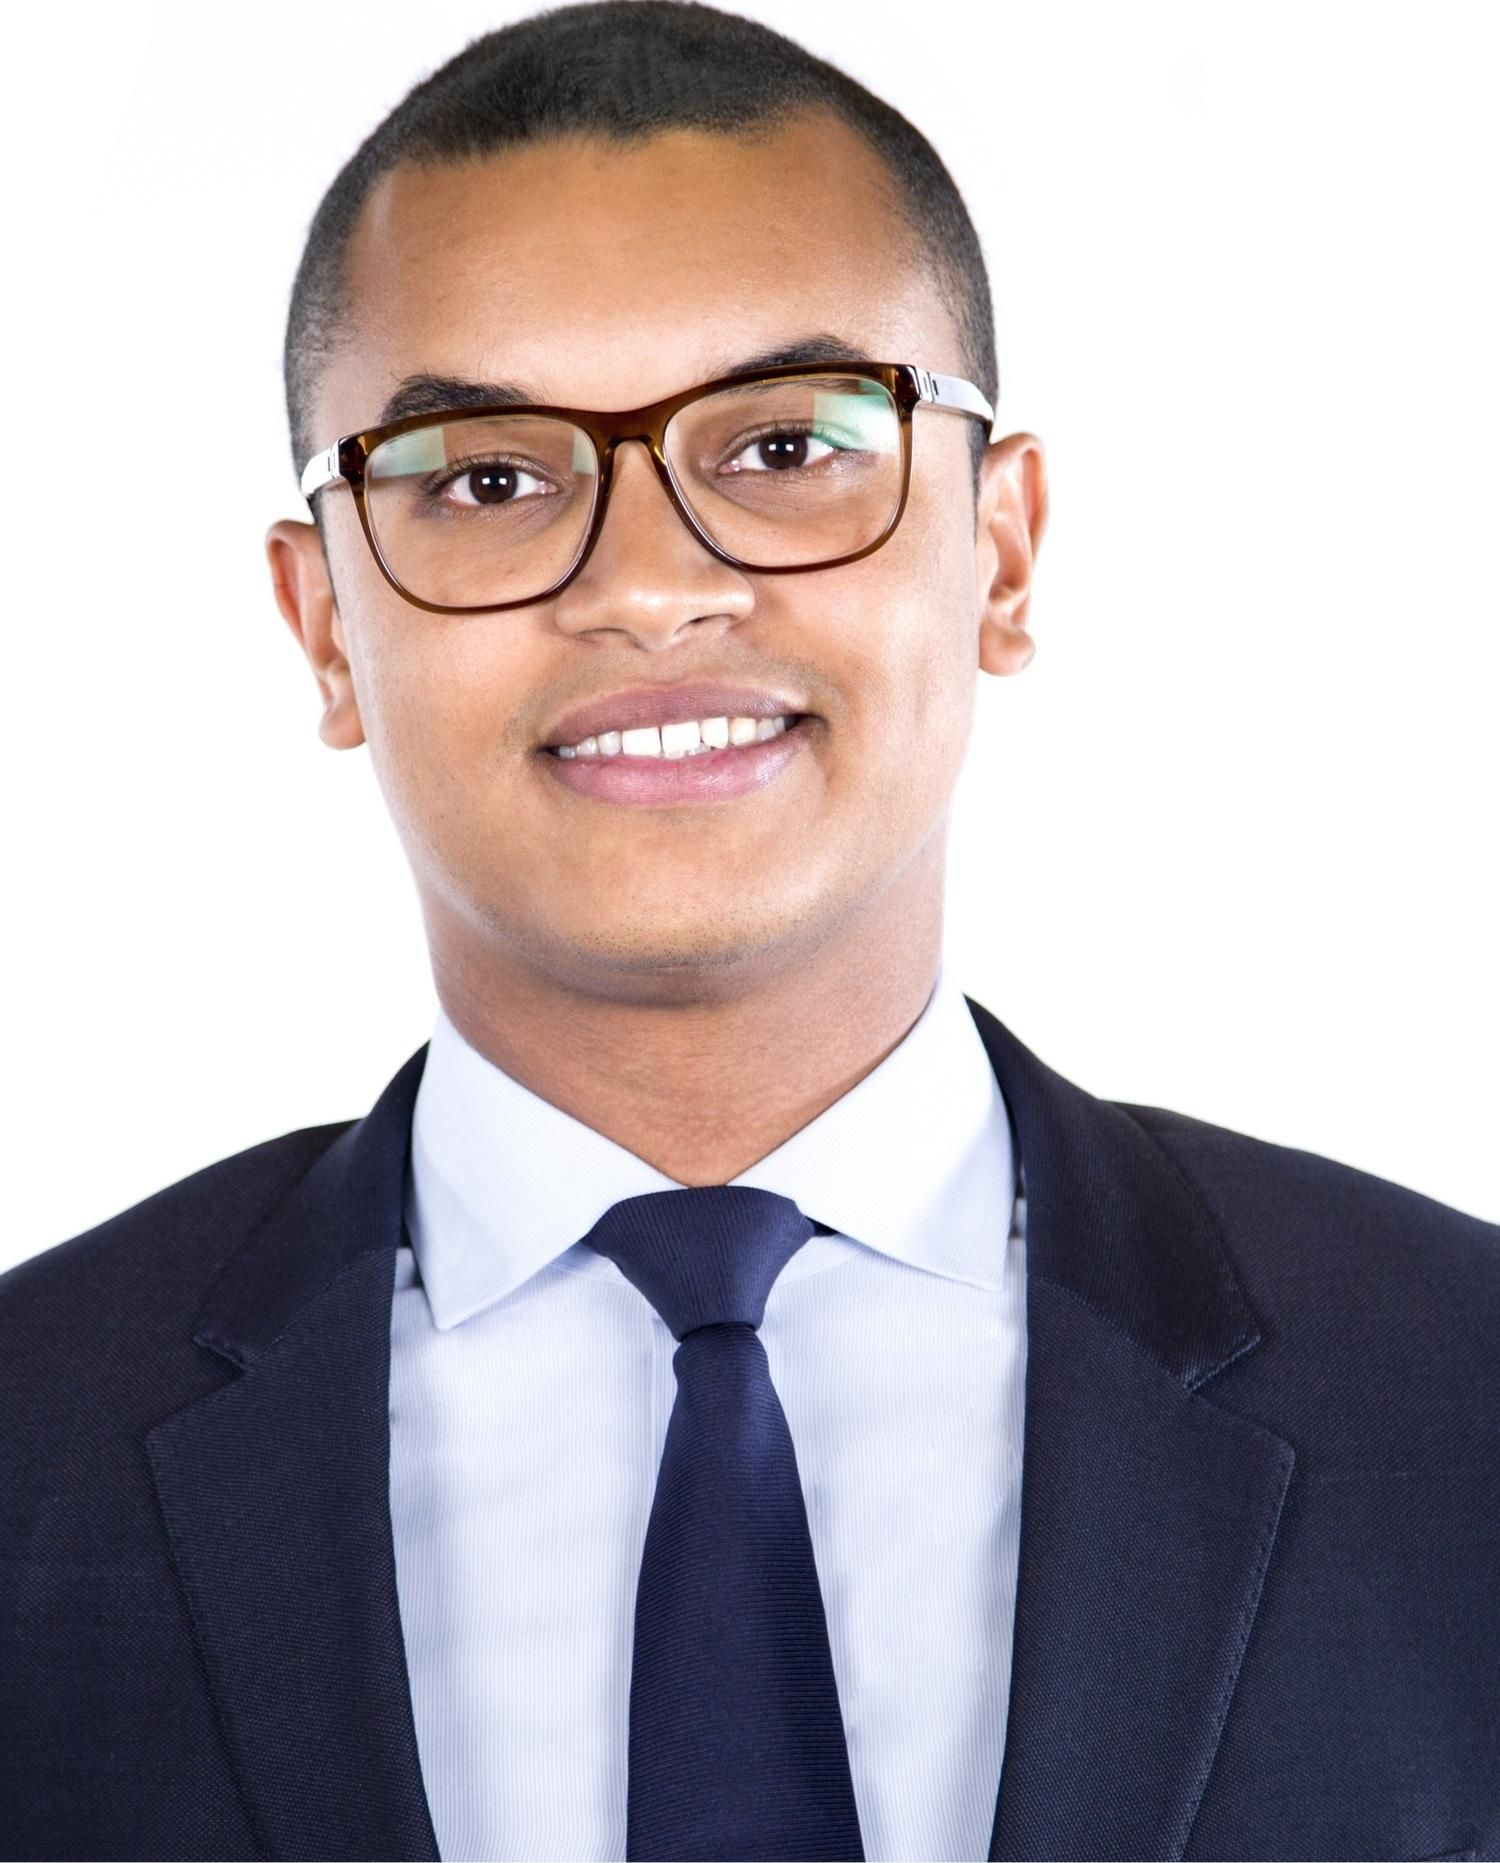 Abdellah Iftahy